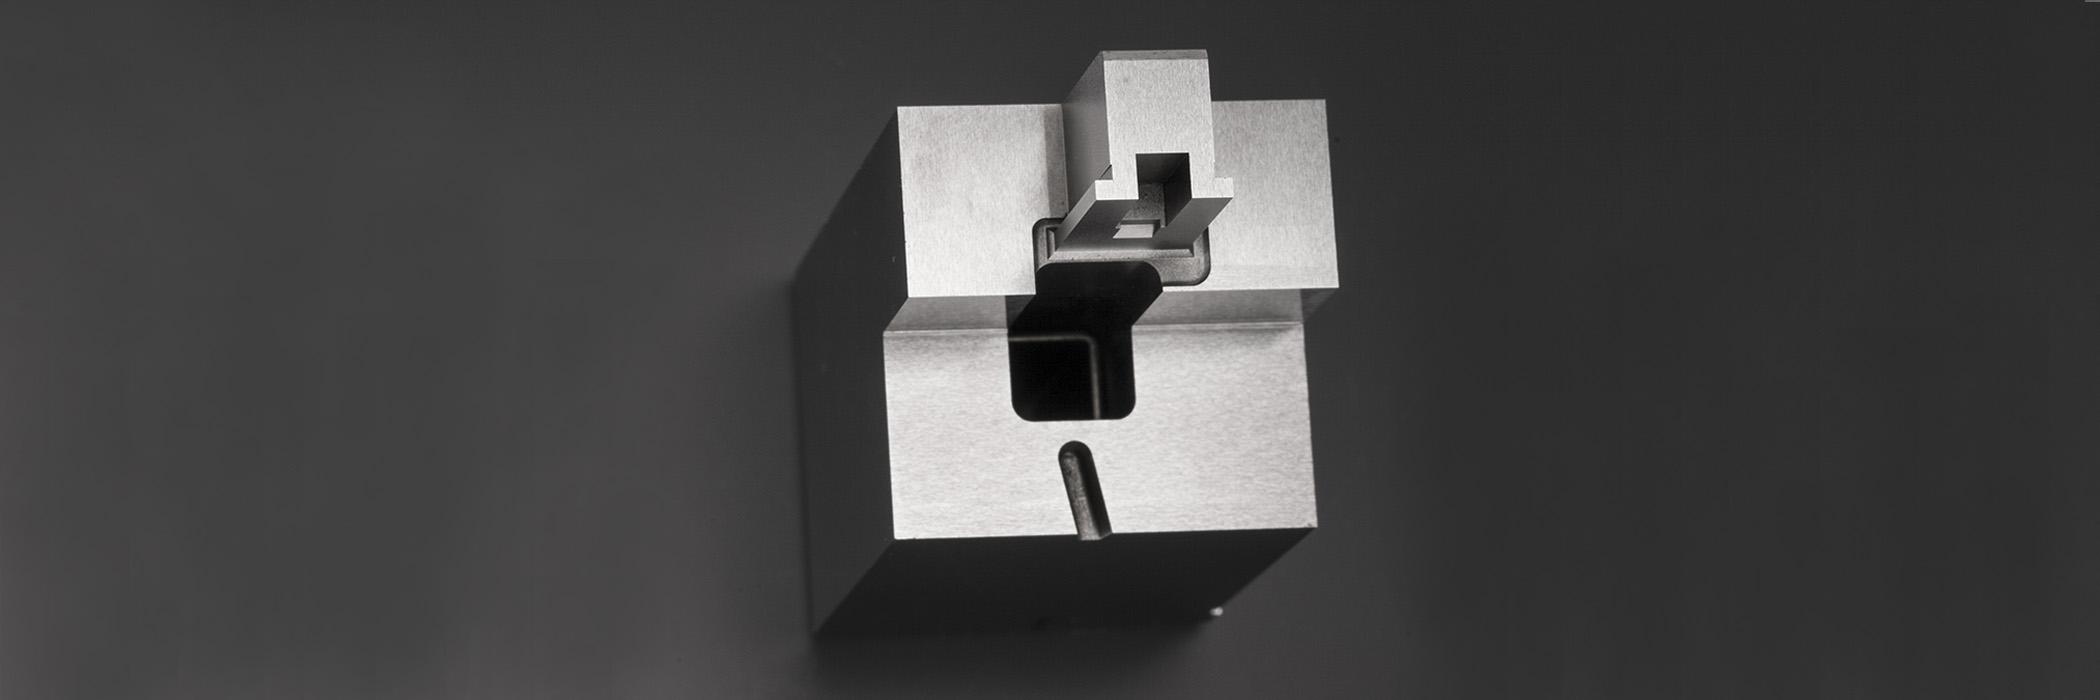 Precision mold part